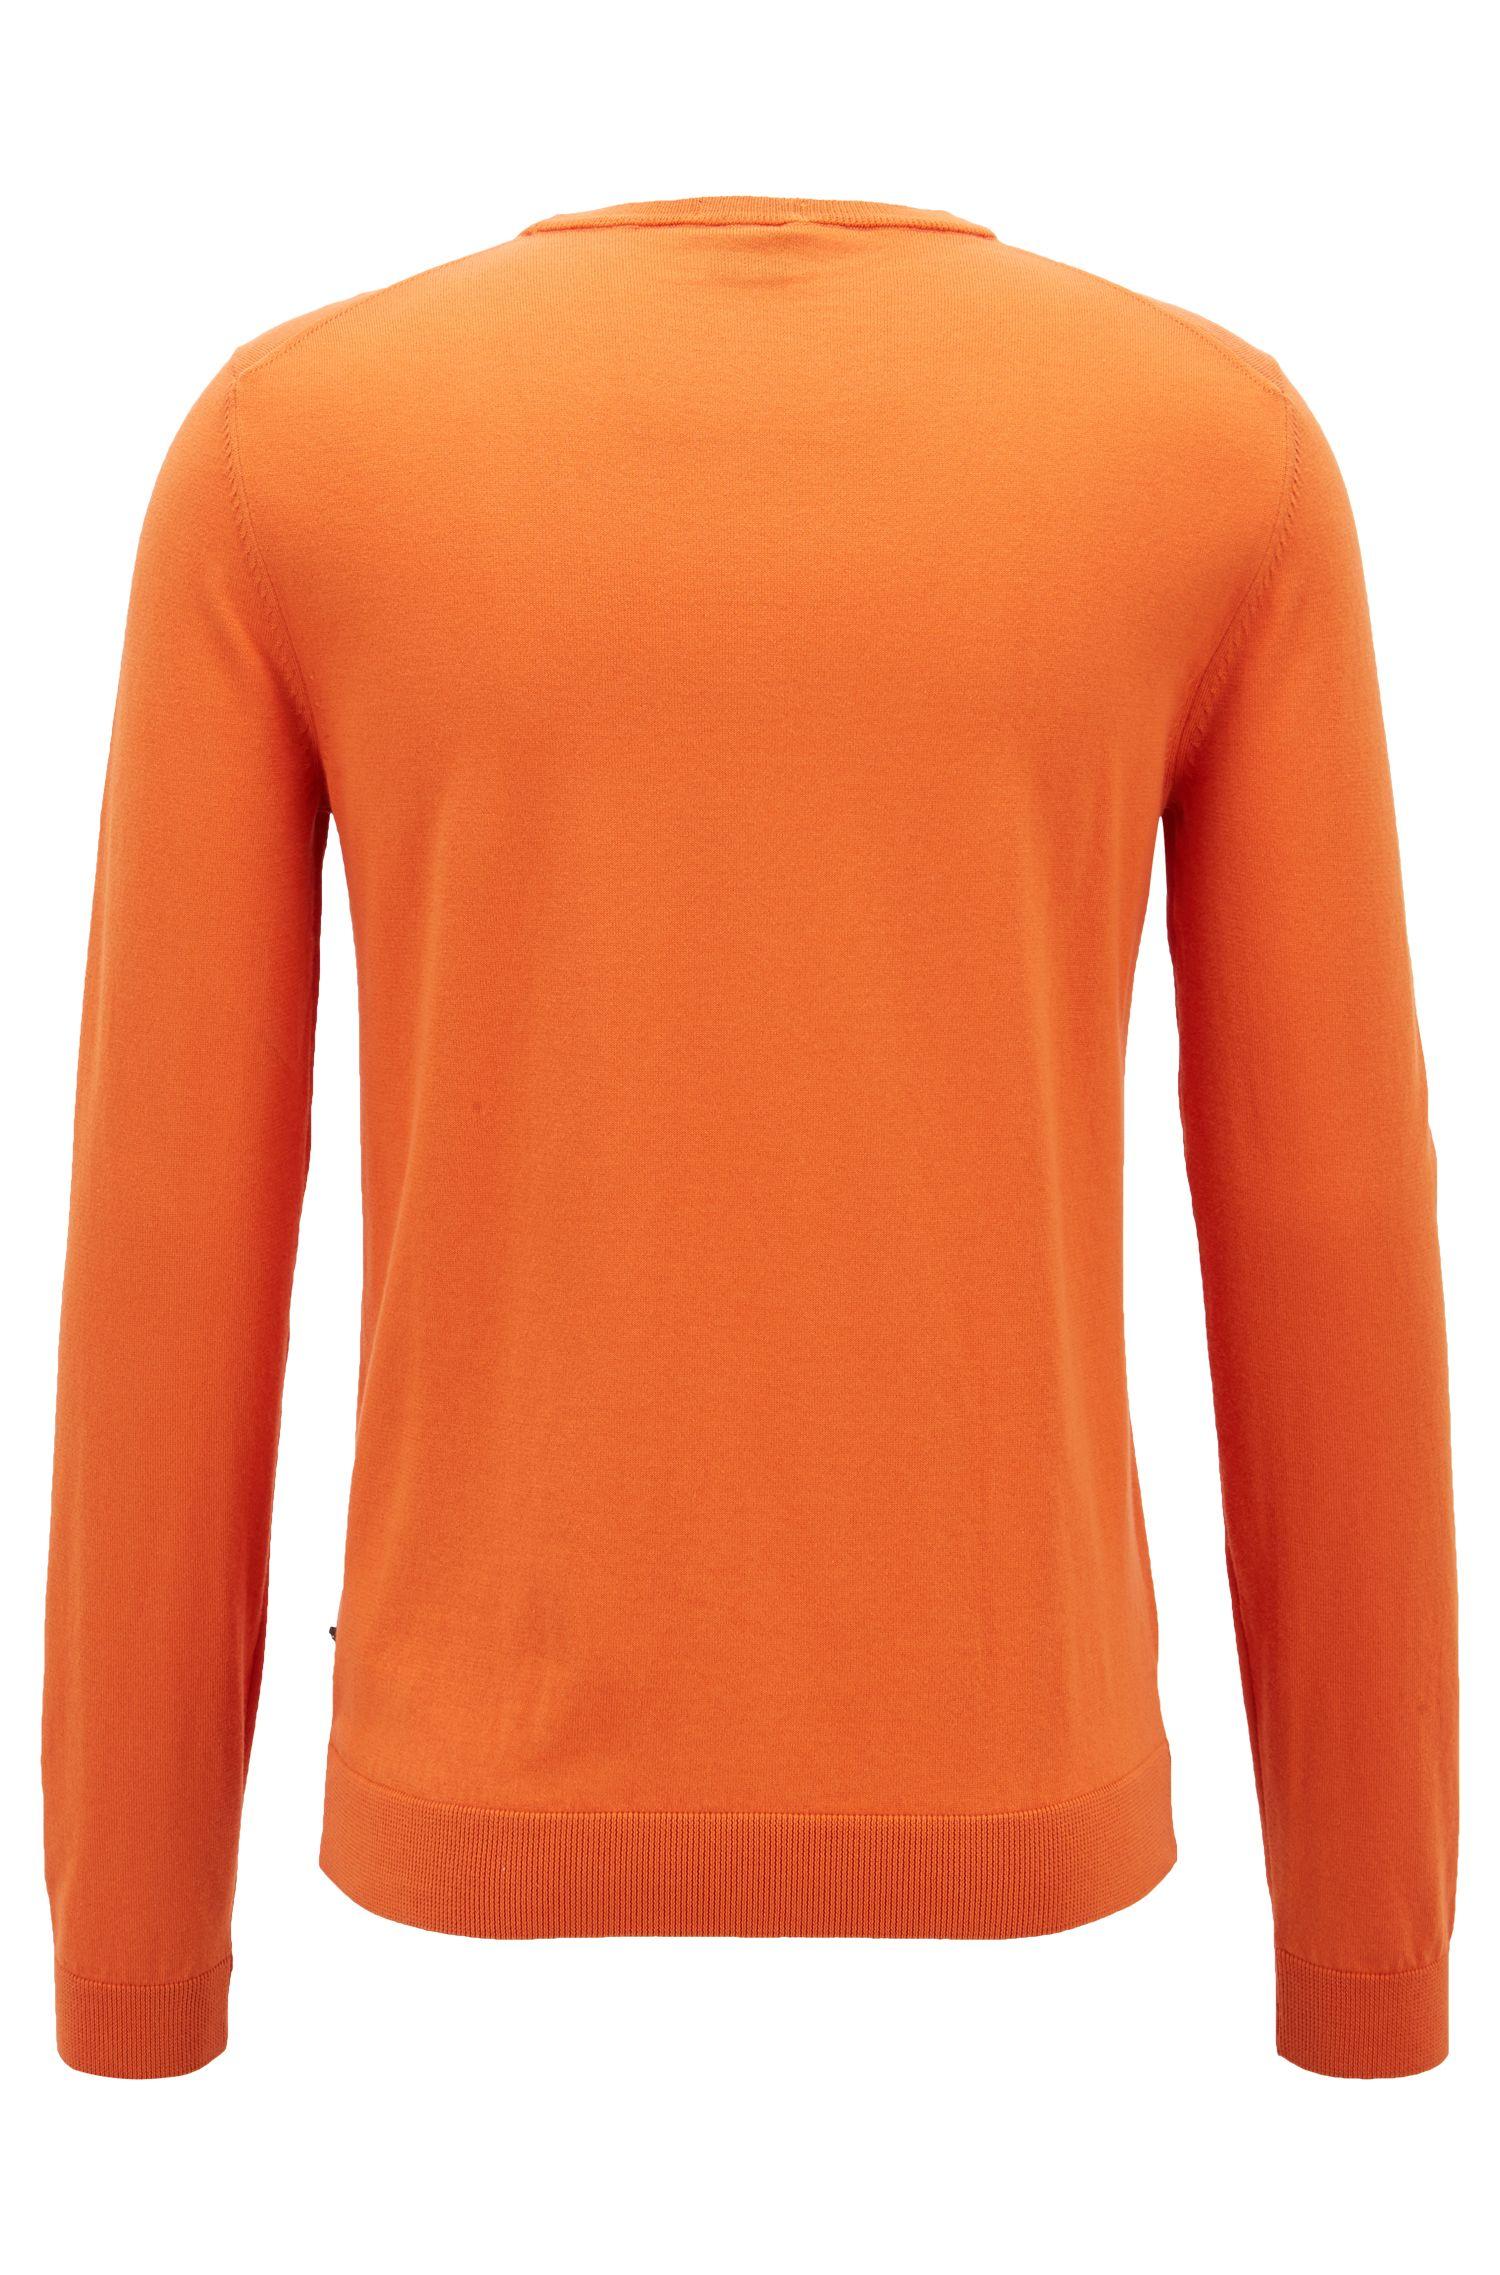 Slim-fit sweater in cotton with contrast inner neckline, Orange